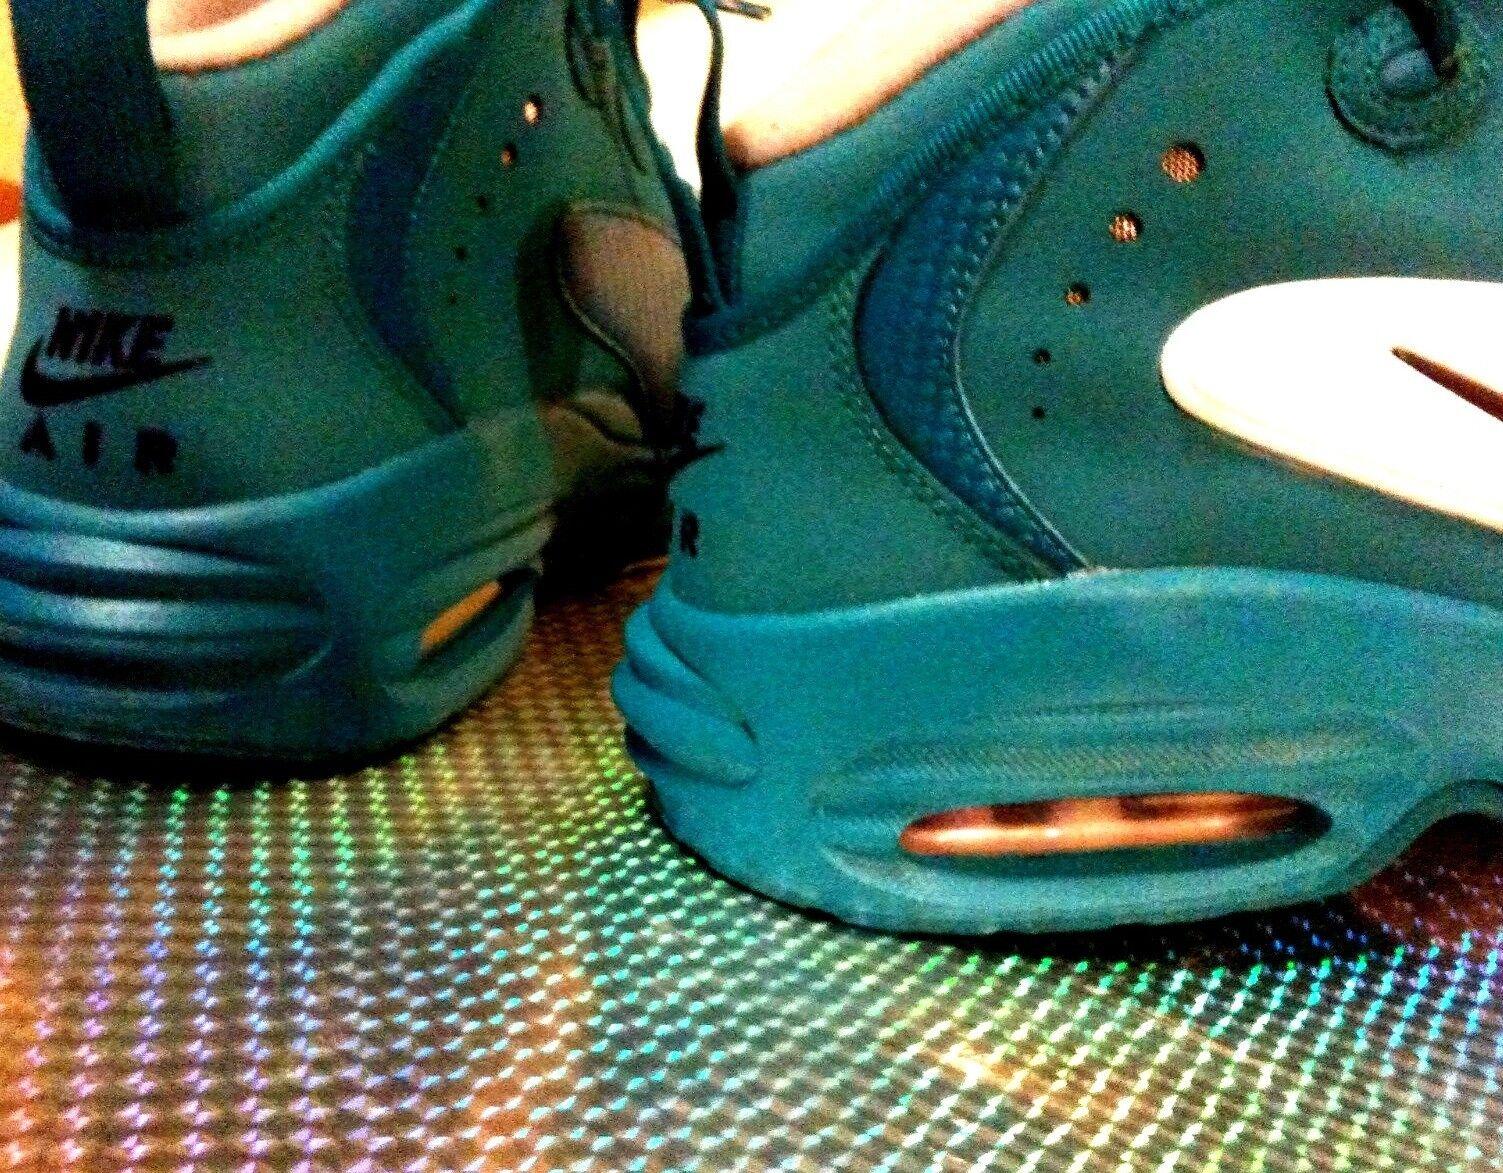 buy online 8c319 bc7ba ... Nike Nike Nike Air Way Up Cool Grey 12 Penny Hardaway Foamposite 1 90  95 Max